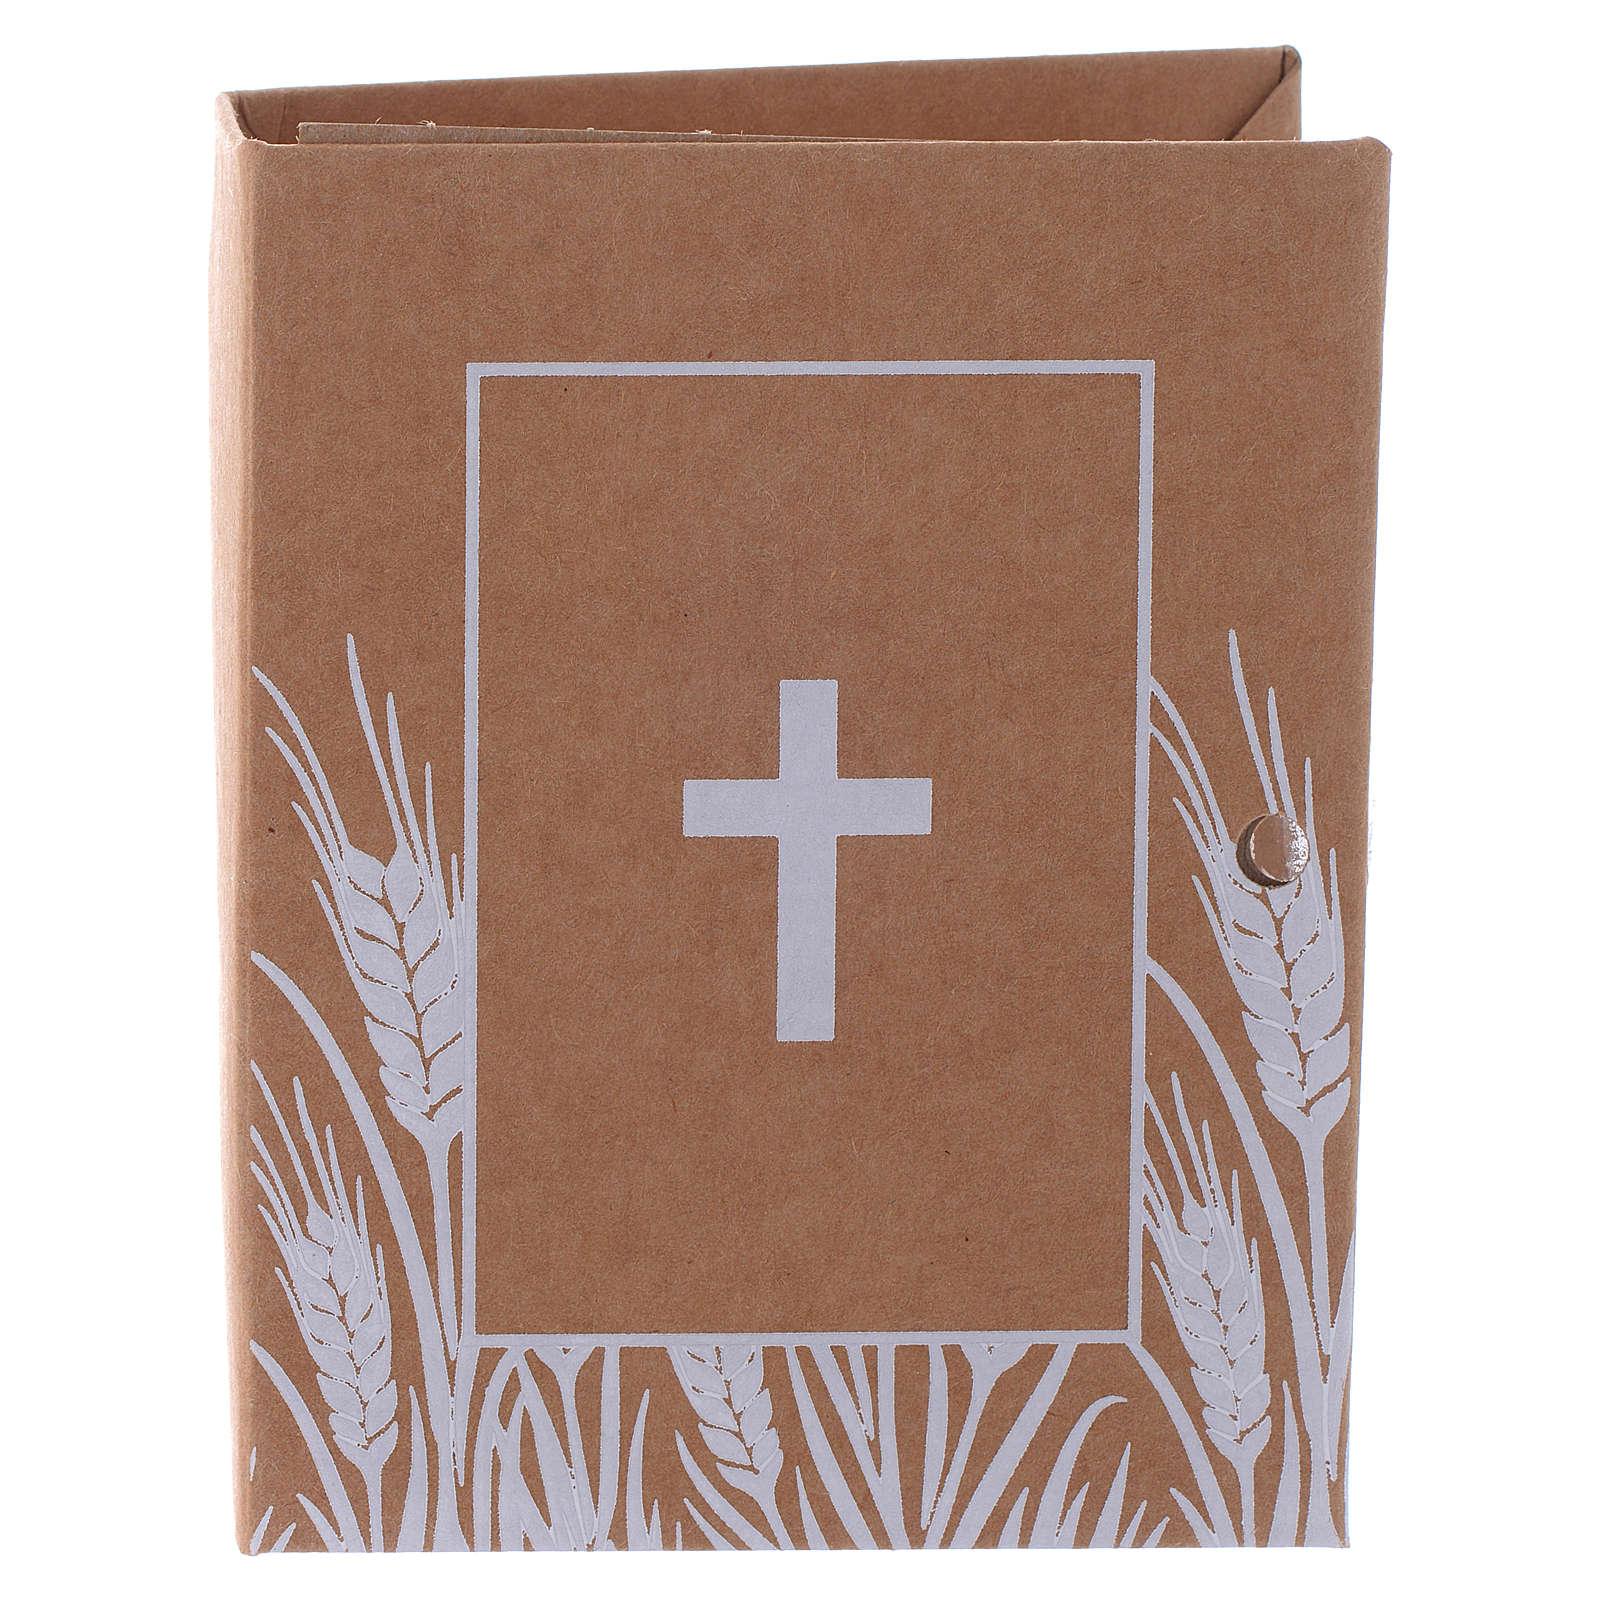 Cajita Recuerdo Estampa Cruz modelo Libro, alt. 7 cm 3